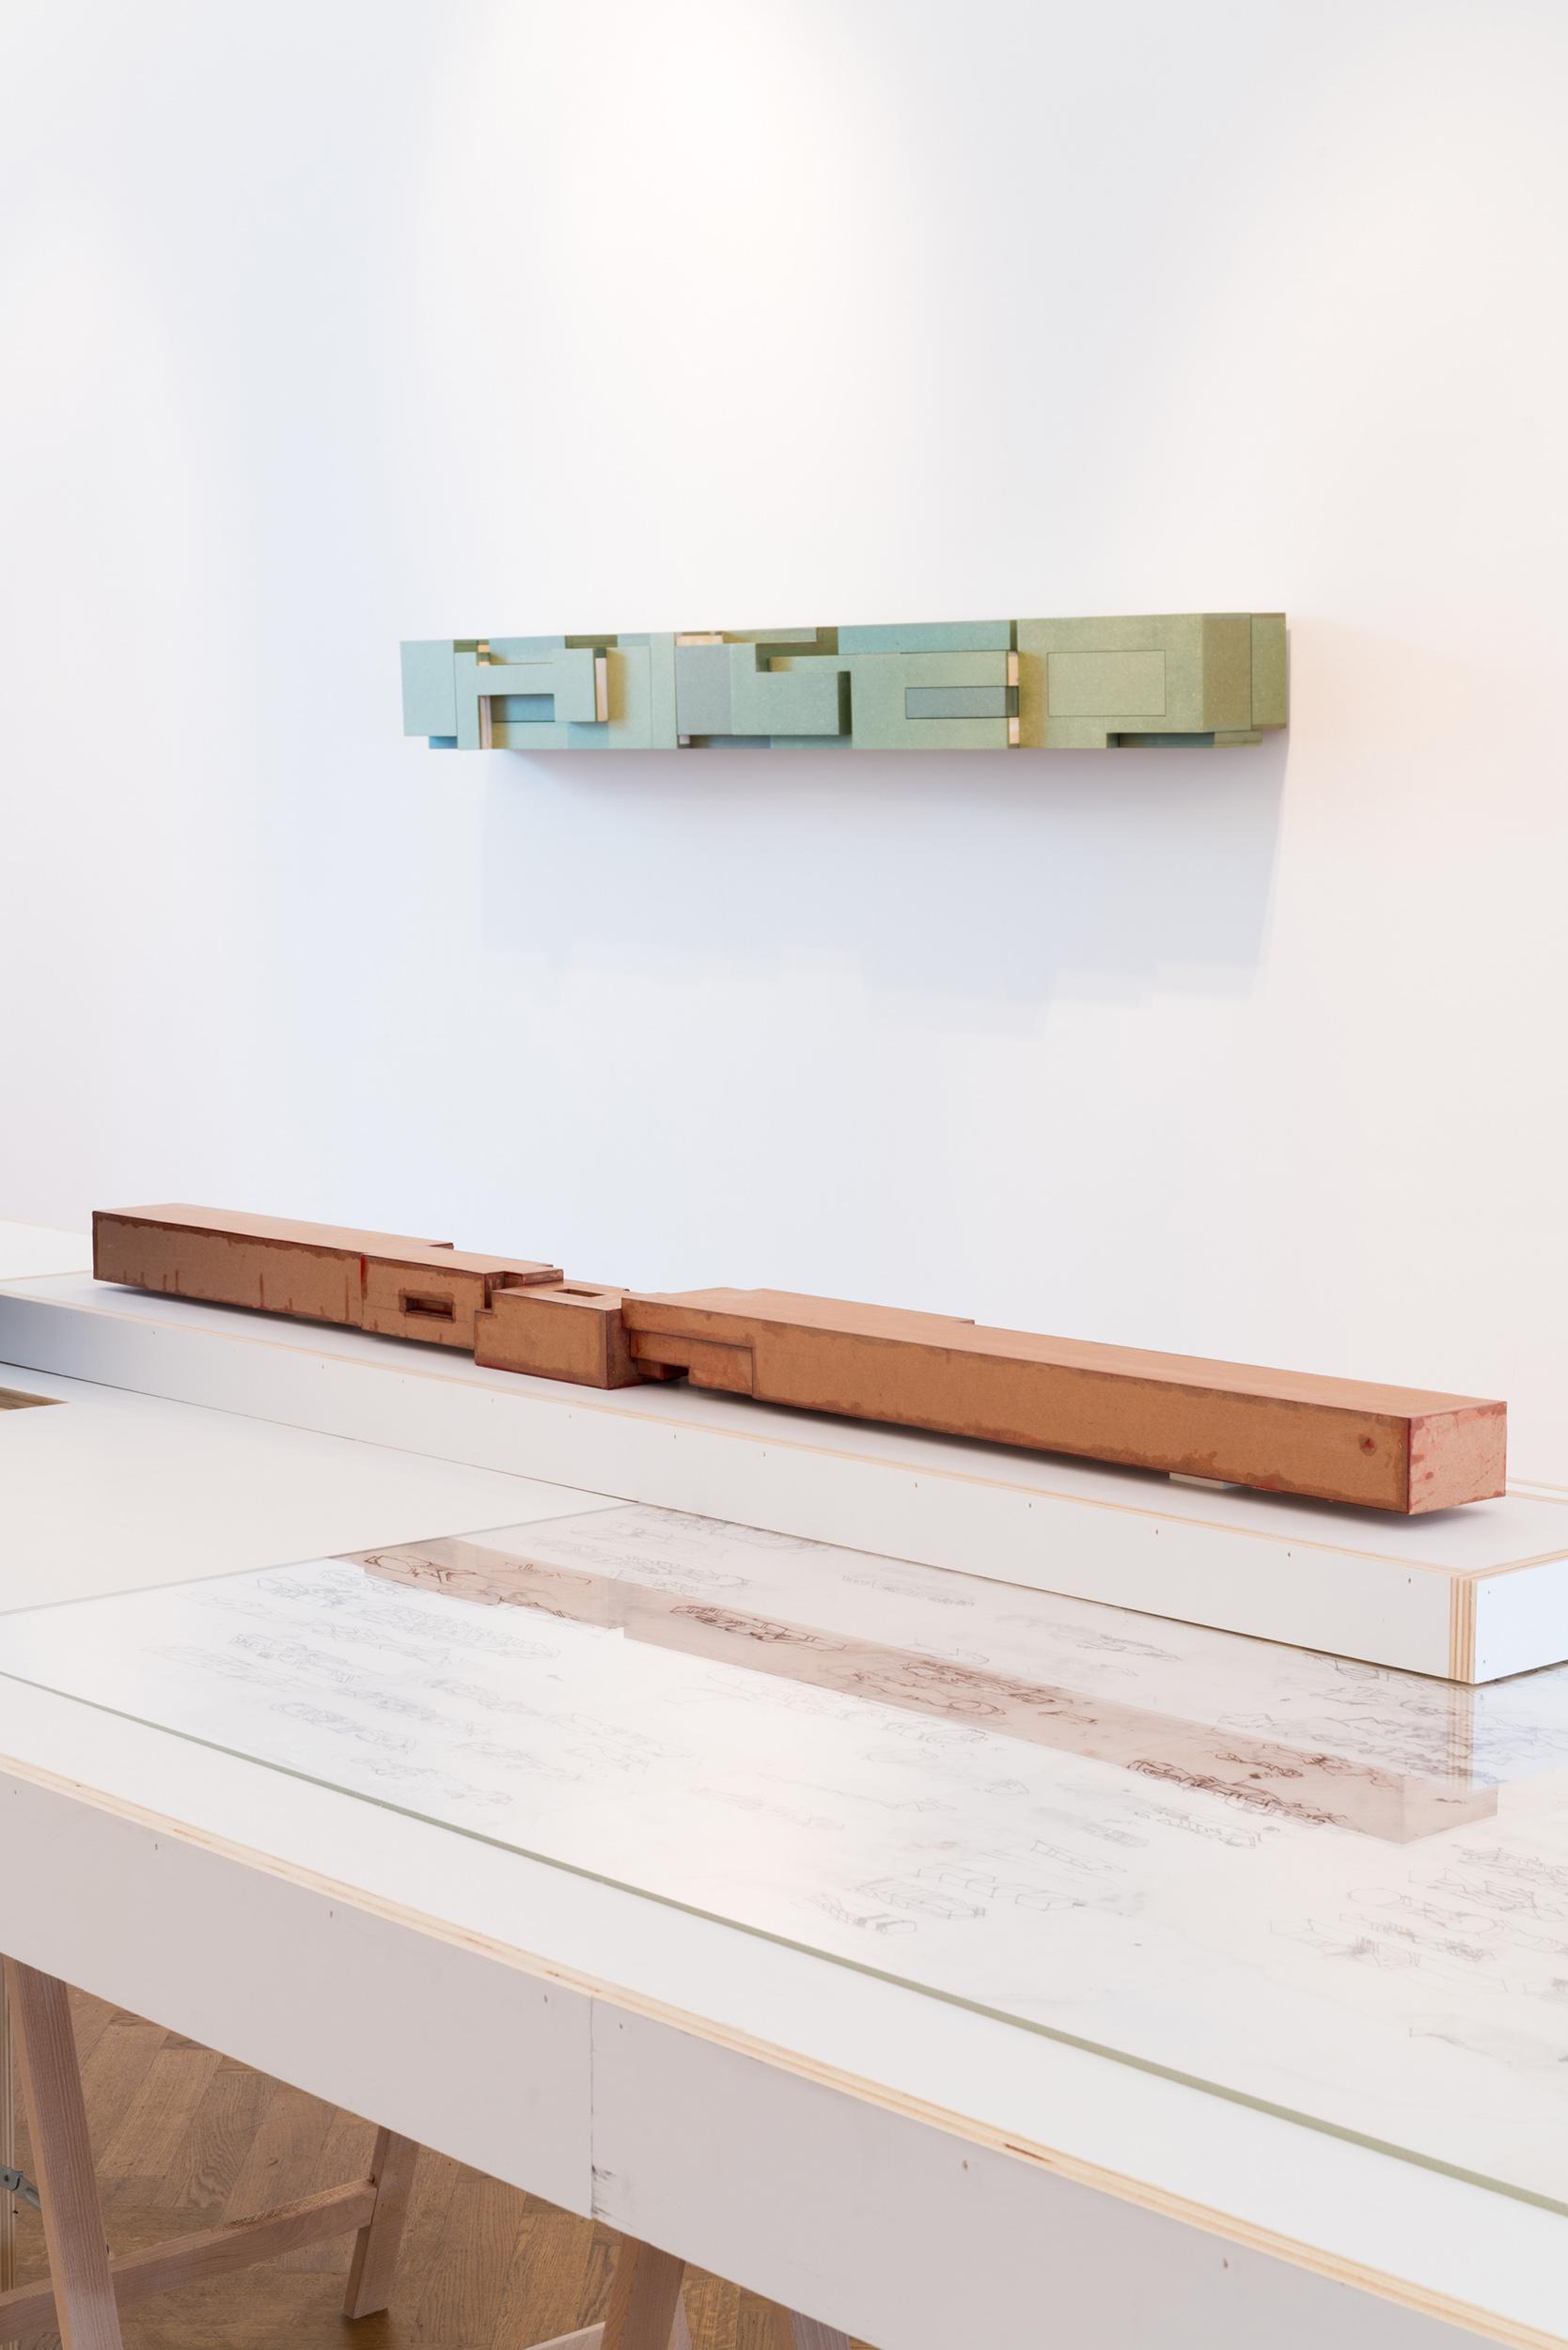 ANNEX Akay, Jeroen Erosie, Boris Tellegen Concordia Beeldende Kunst